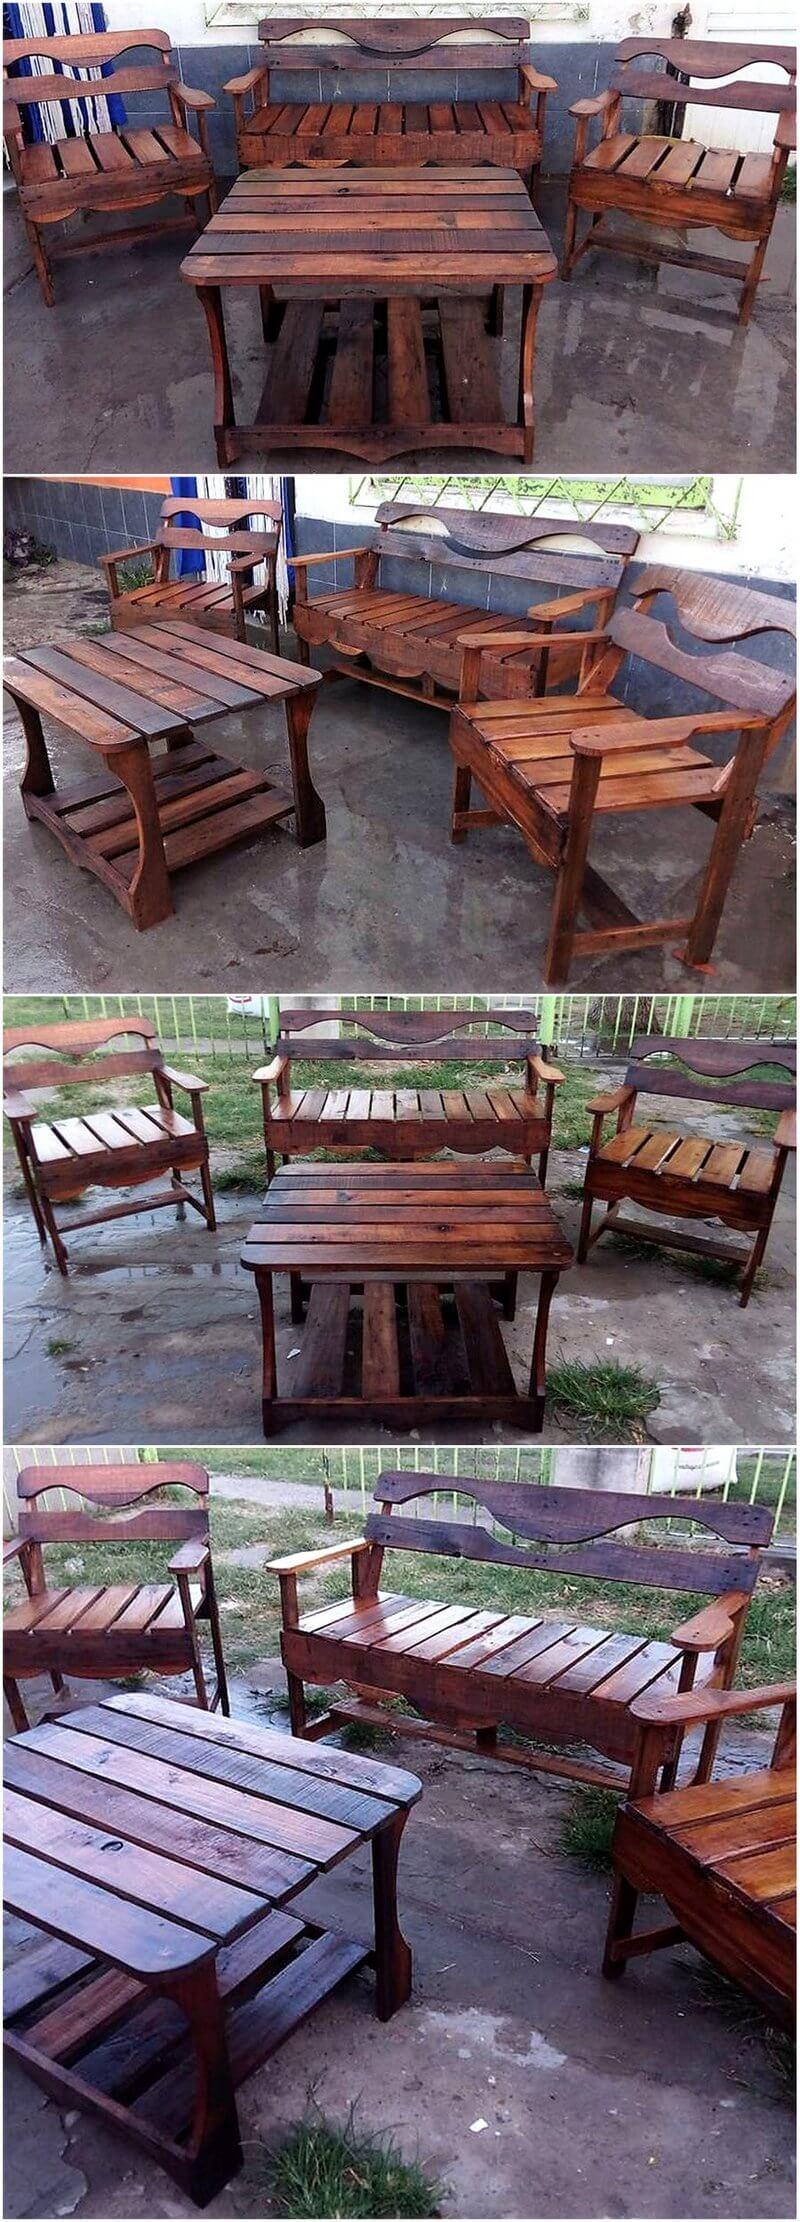 repurposed wood pallets furniture